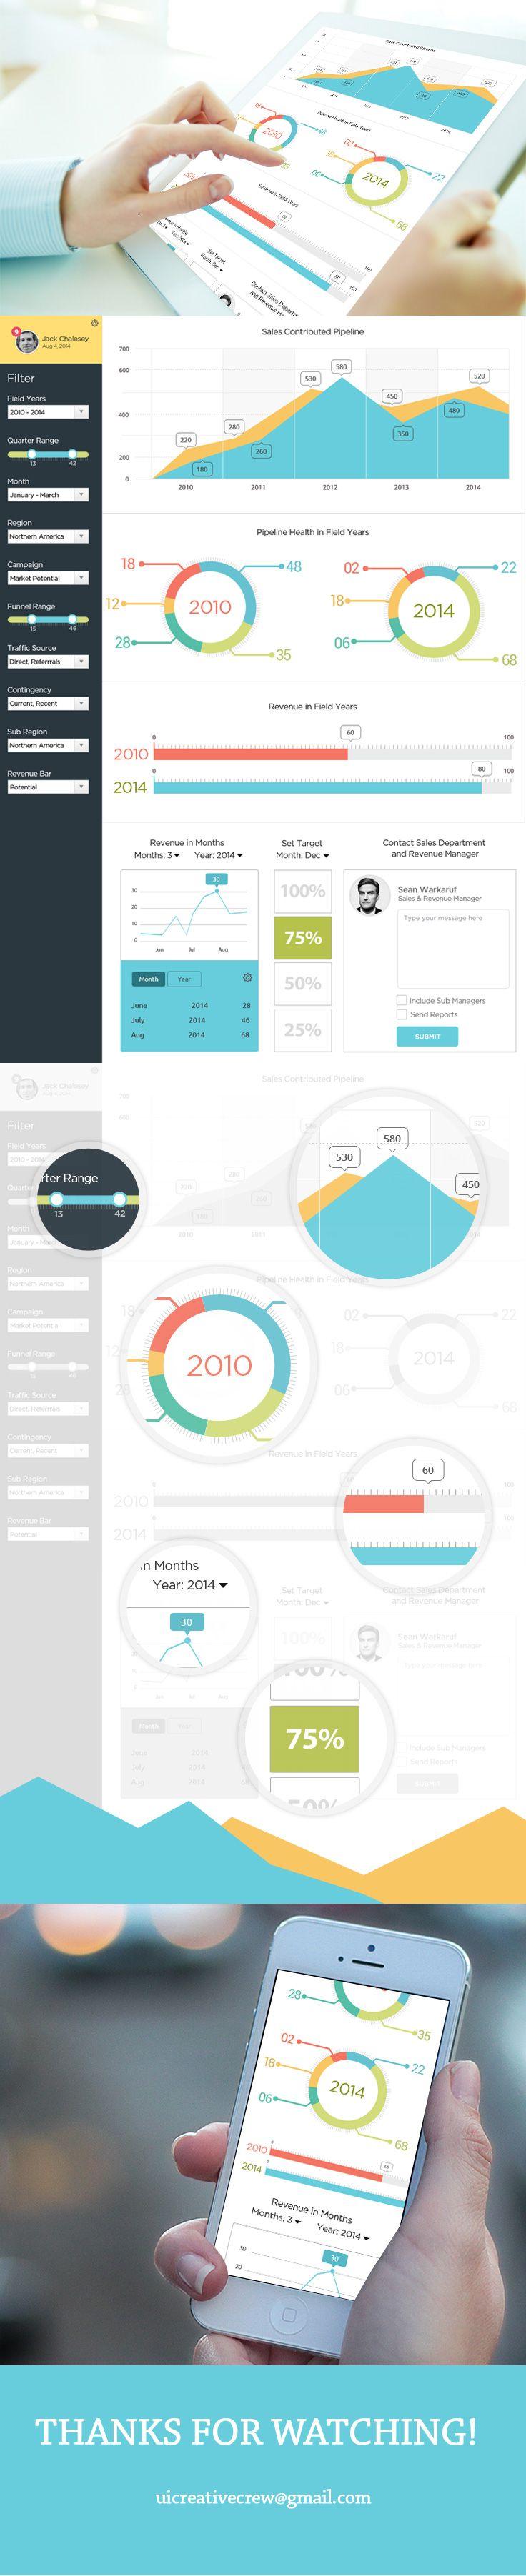 ui design, creative, clean, unique, user interface, website, homepage, inspiration, dashboard, UI, UX, webdesign, simple, minimal, responsive, flat, interface design, Sales app, ui, user interface, iphone, dashboard, ios7, ios8, app, mobile app